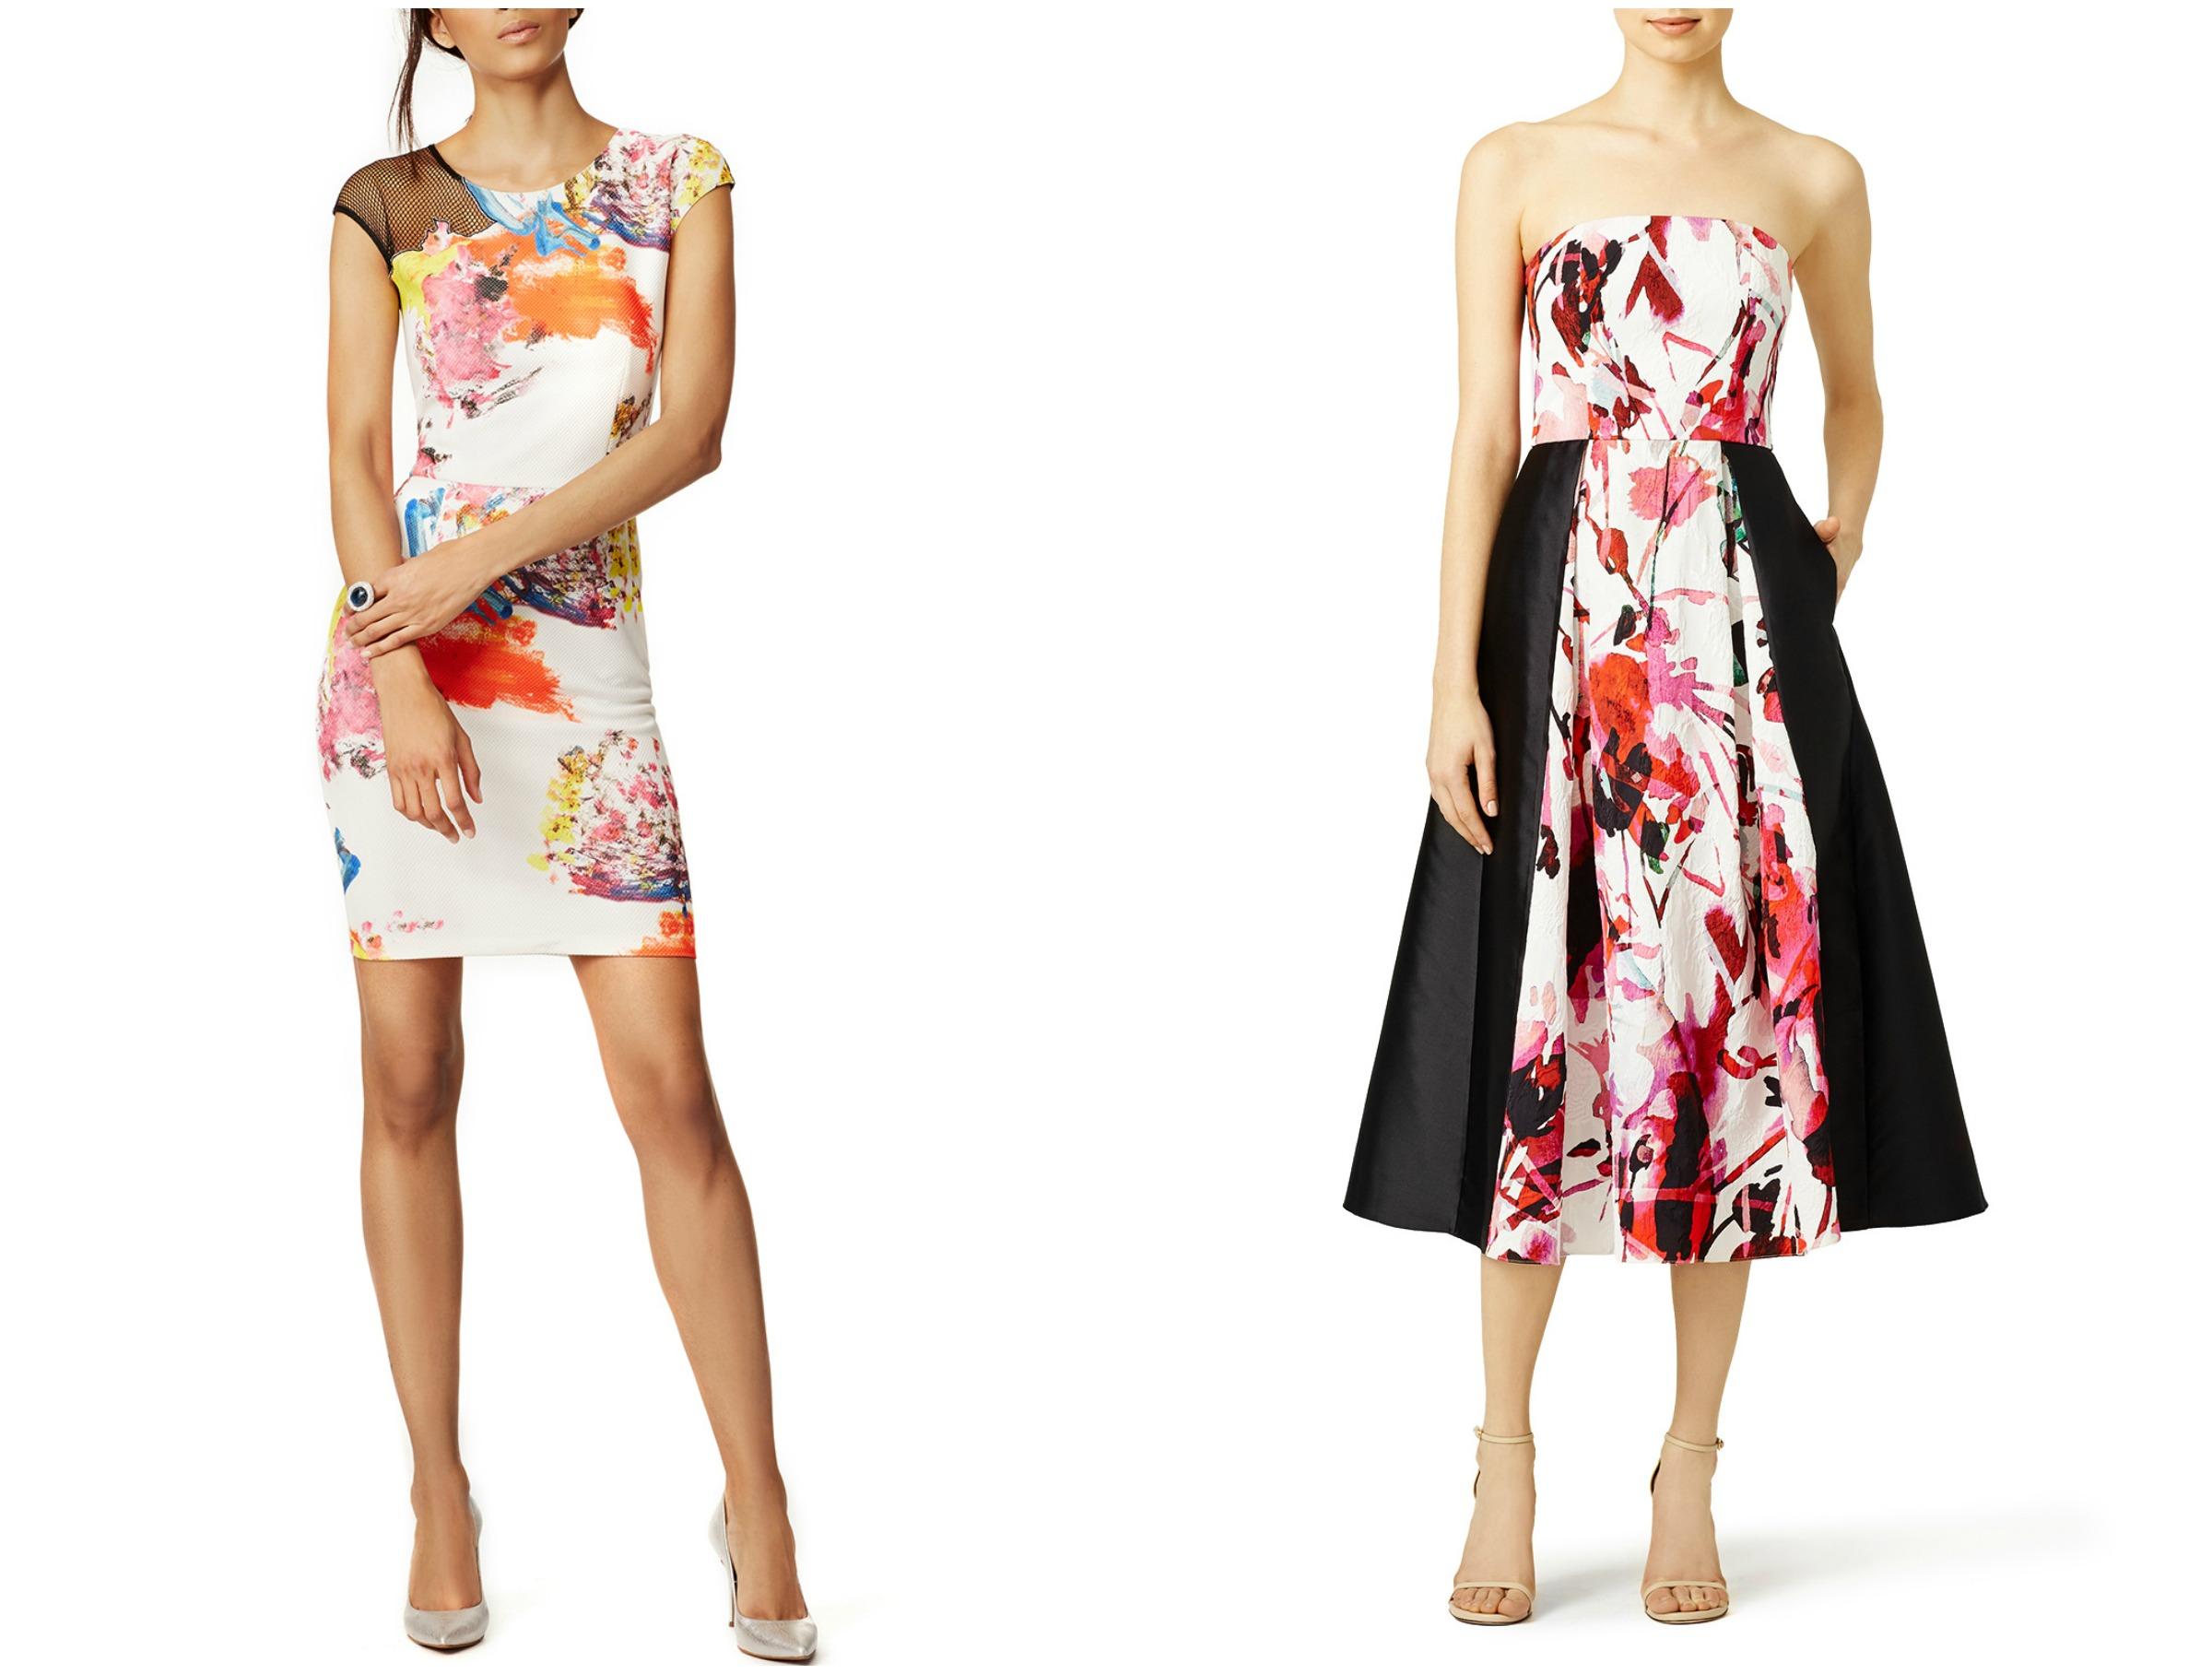 Floral Dress Collage 2